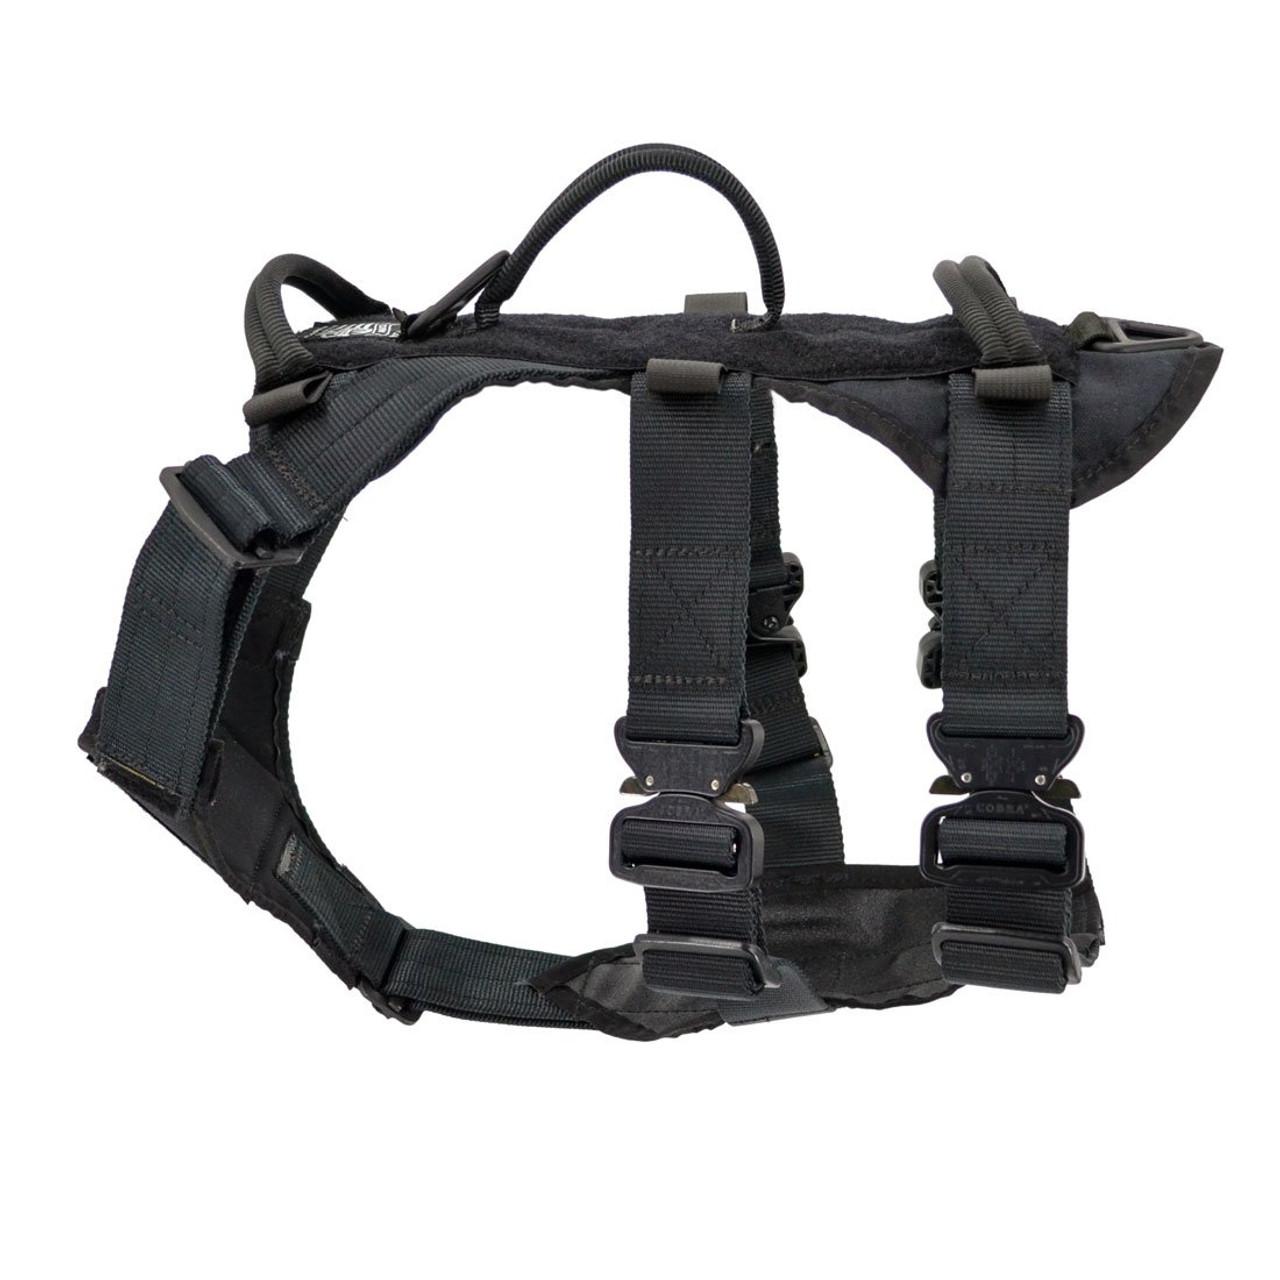 Greek style white /& black harness